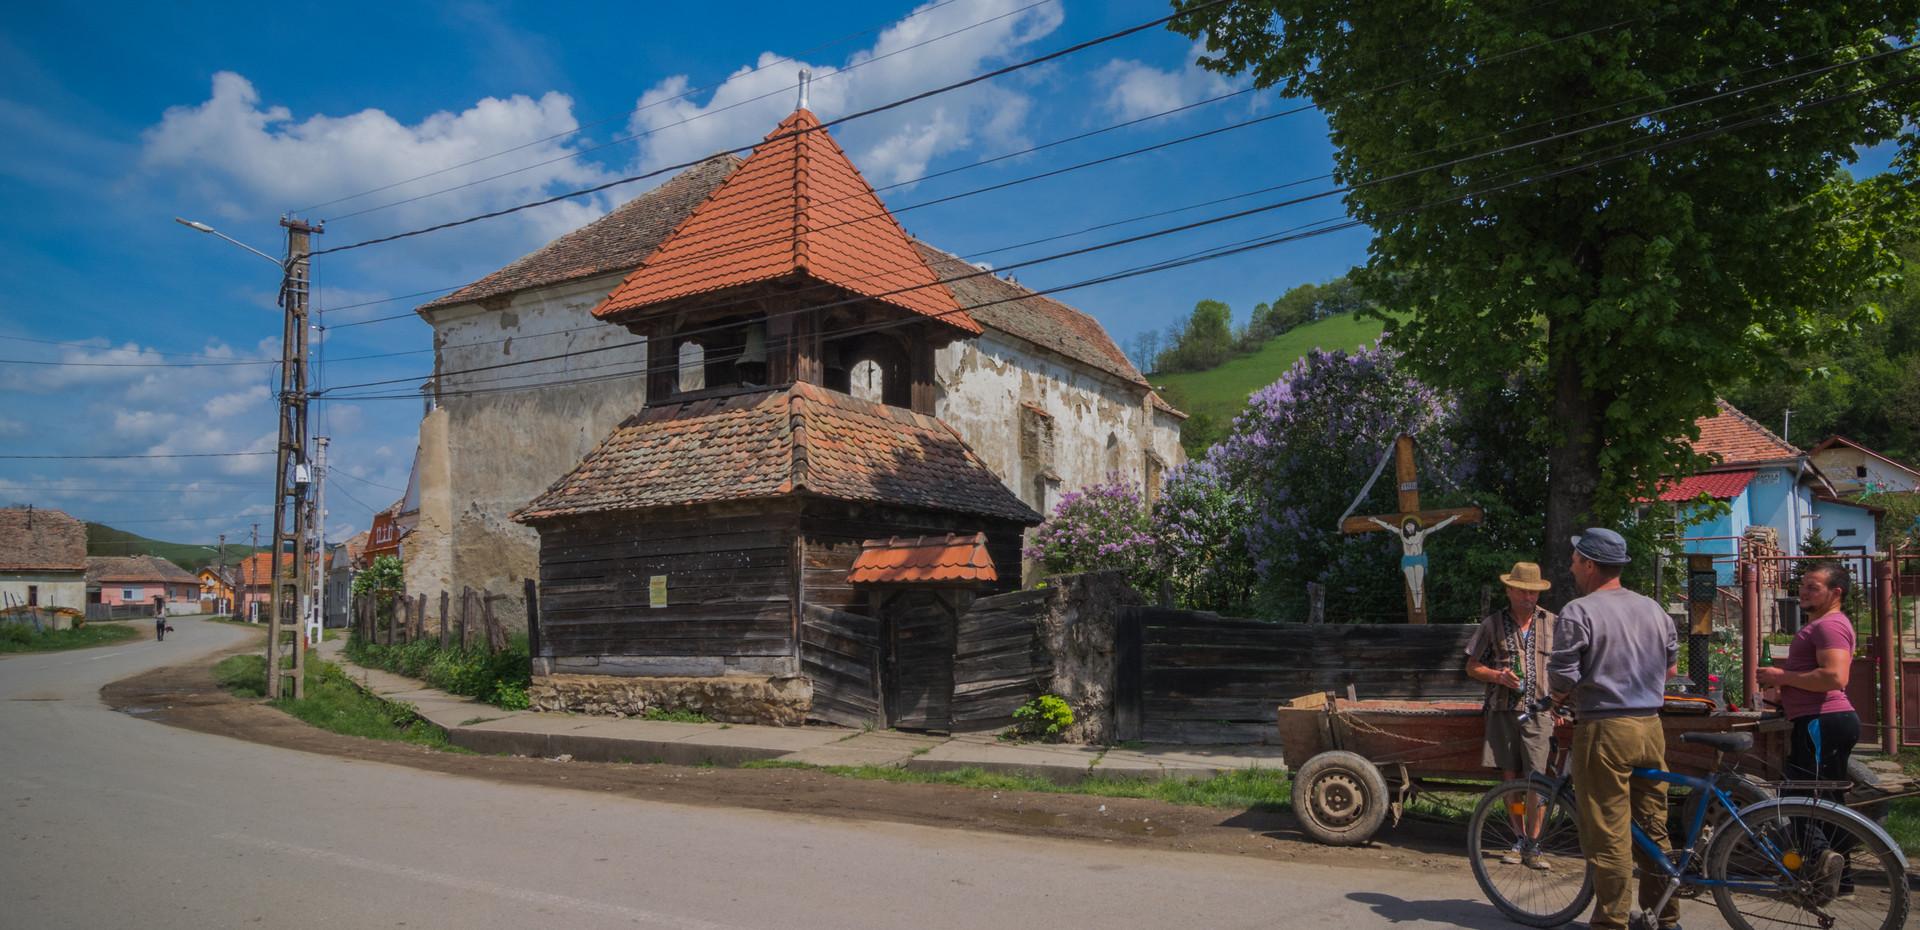 Somogyom / Șmig Sibiu county / Szeben megye / județul Sibiu Romania / Románia / România / 2018